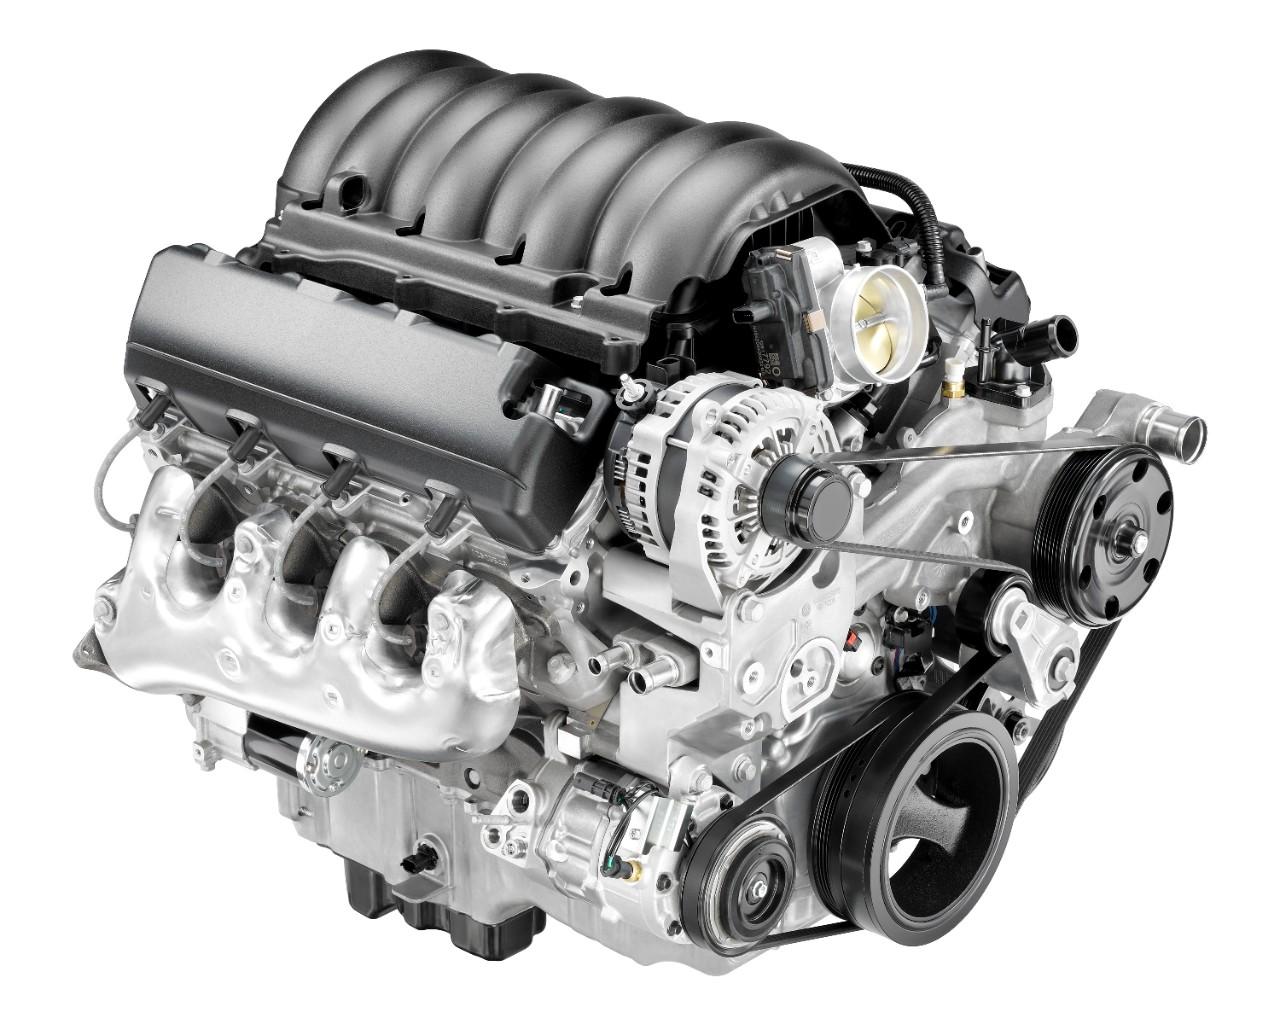 Gm Reveals New Ecotec3 Family Of Engines For Light Duty Trucks Chevy Vortec Engine Cq5damweb12801280 5